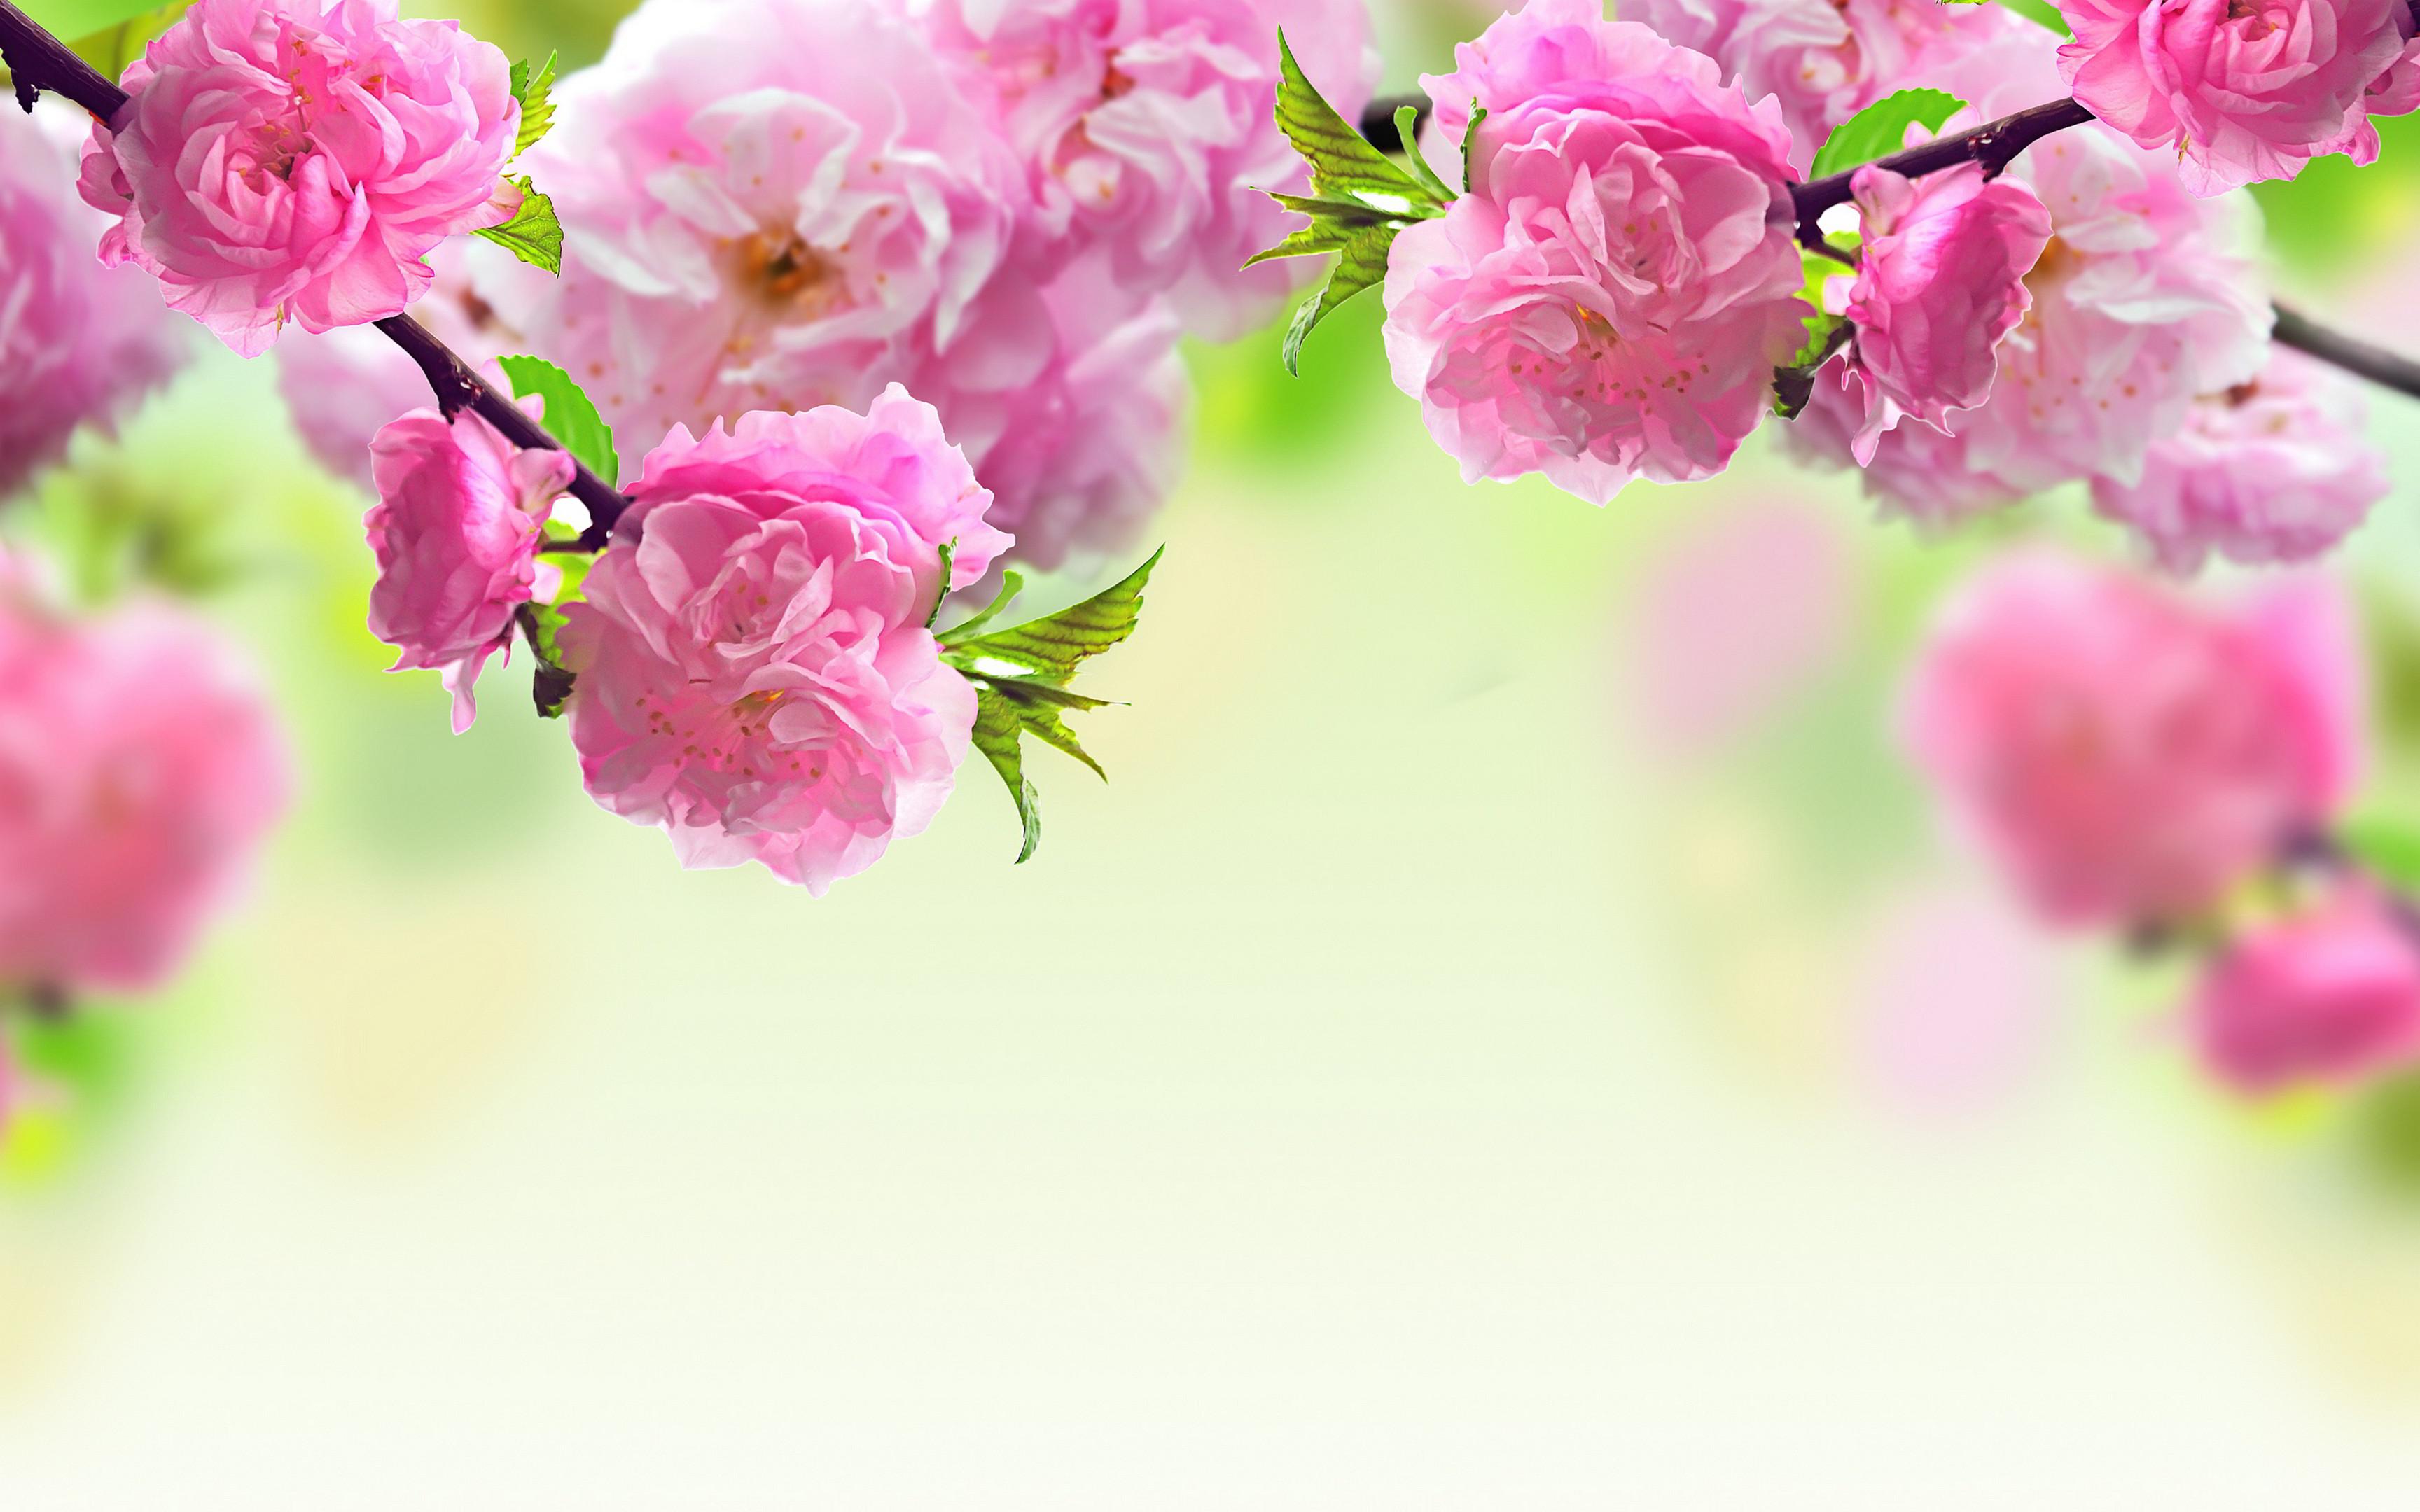 MACRO wallpaper | Pink Spring Flowers Macro Wallpaper HD Free Desktop  #429003773